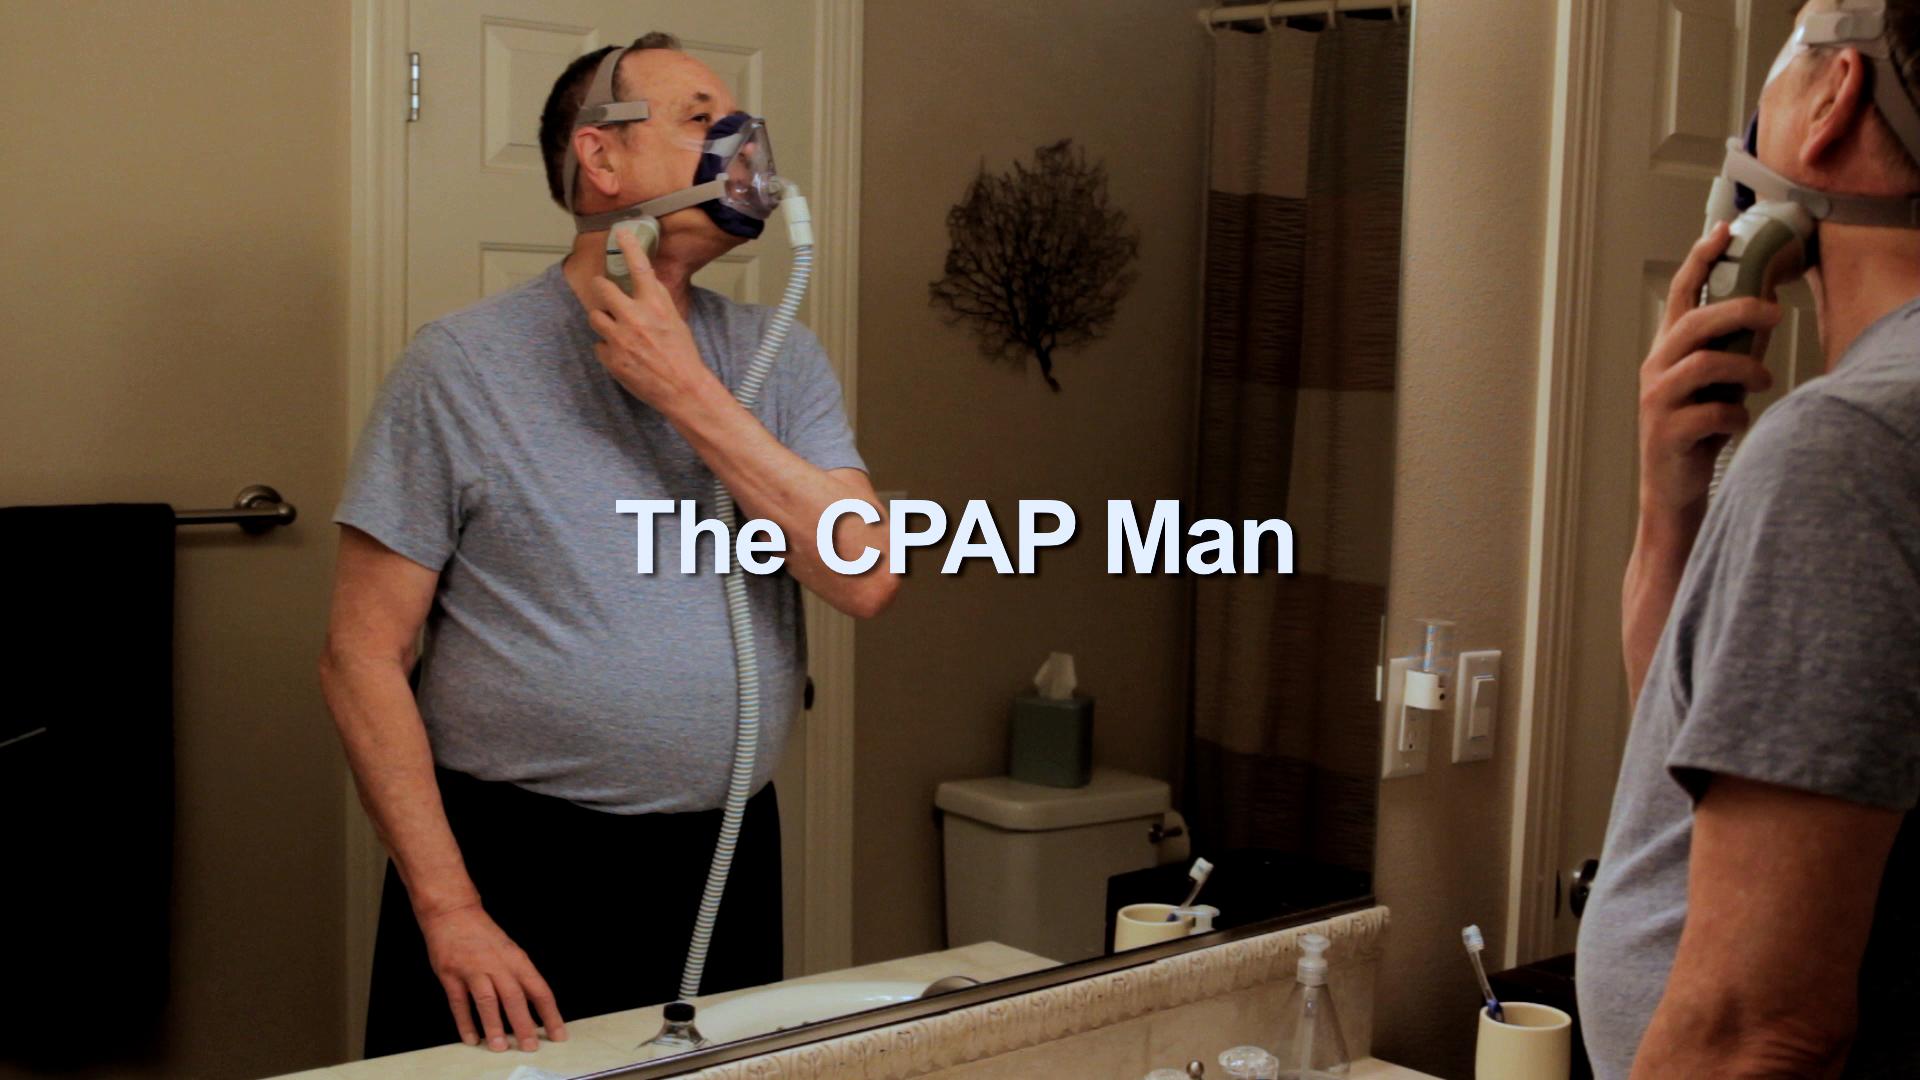 cpap-man-thumb.jpg